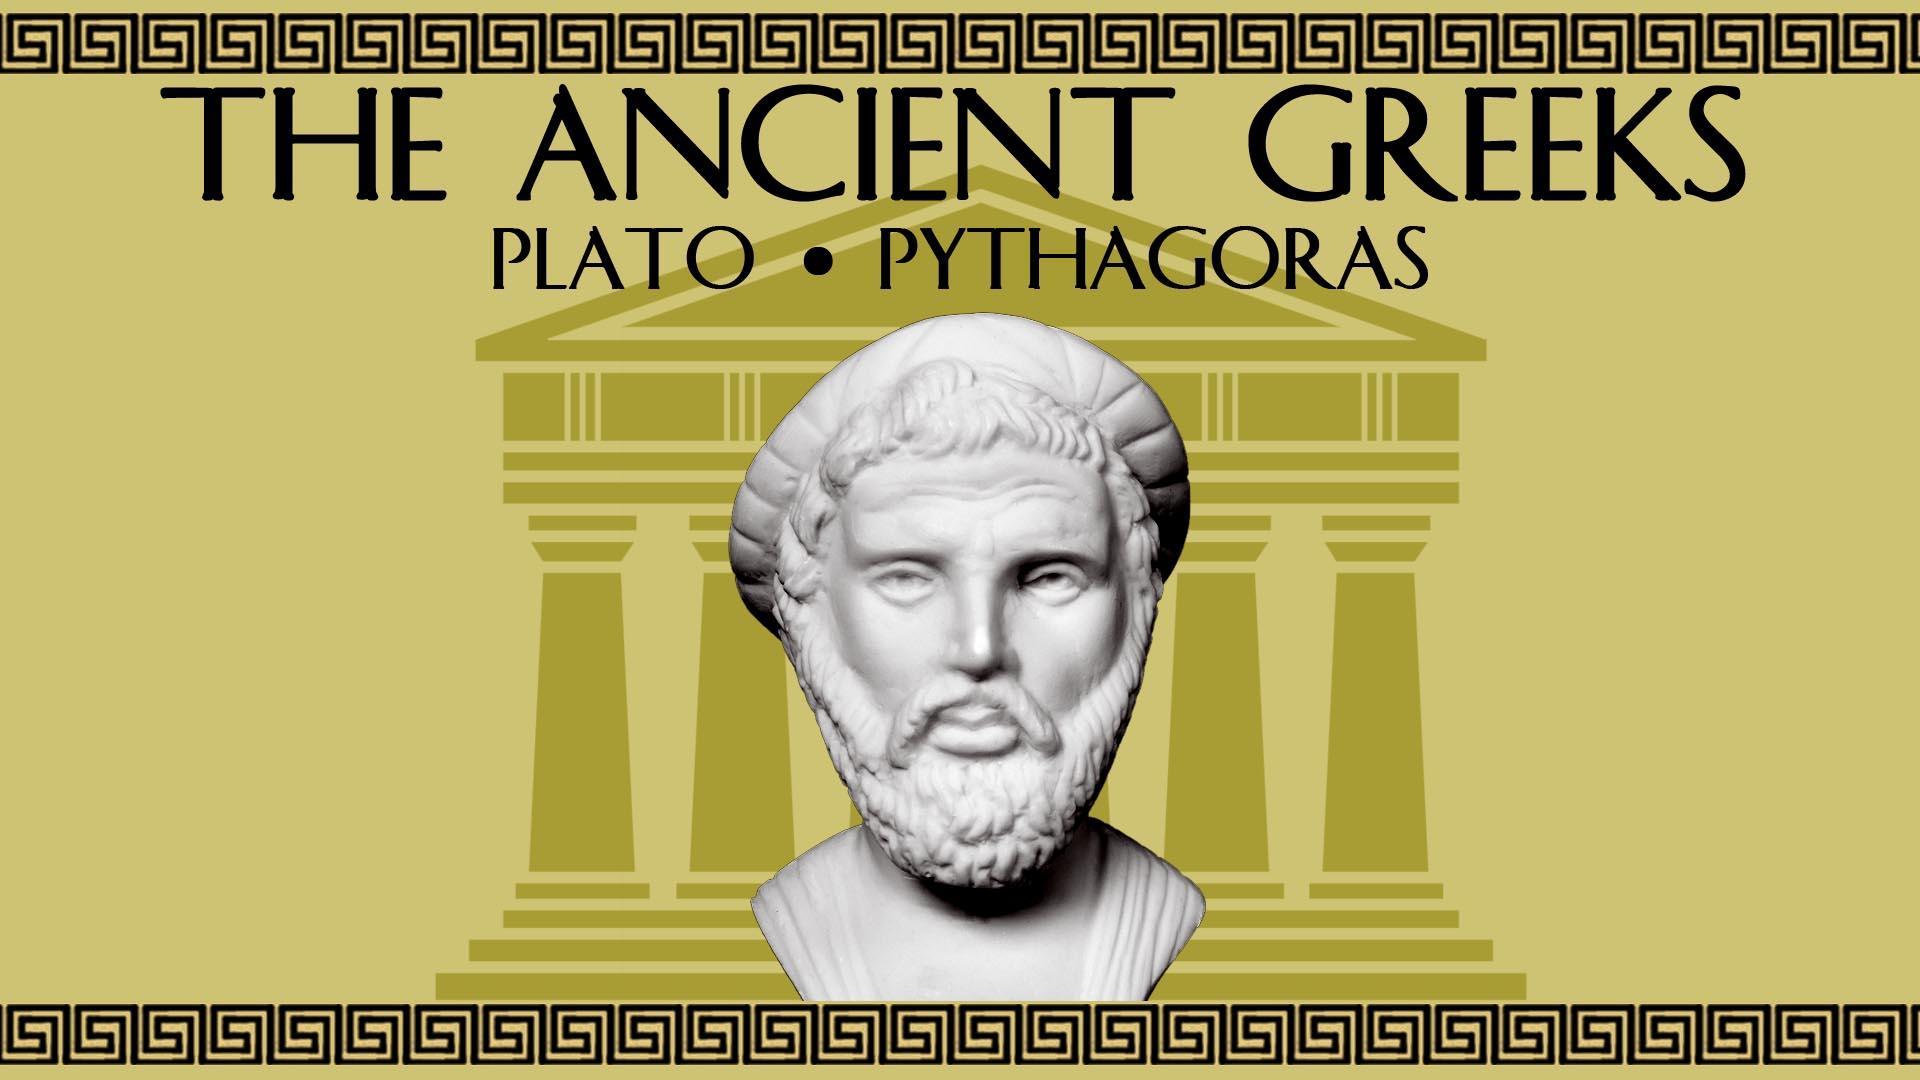 The Ancient Greeks: Plato, Pythagoras